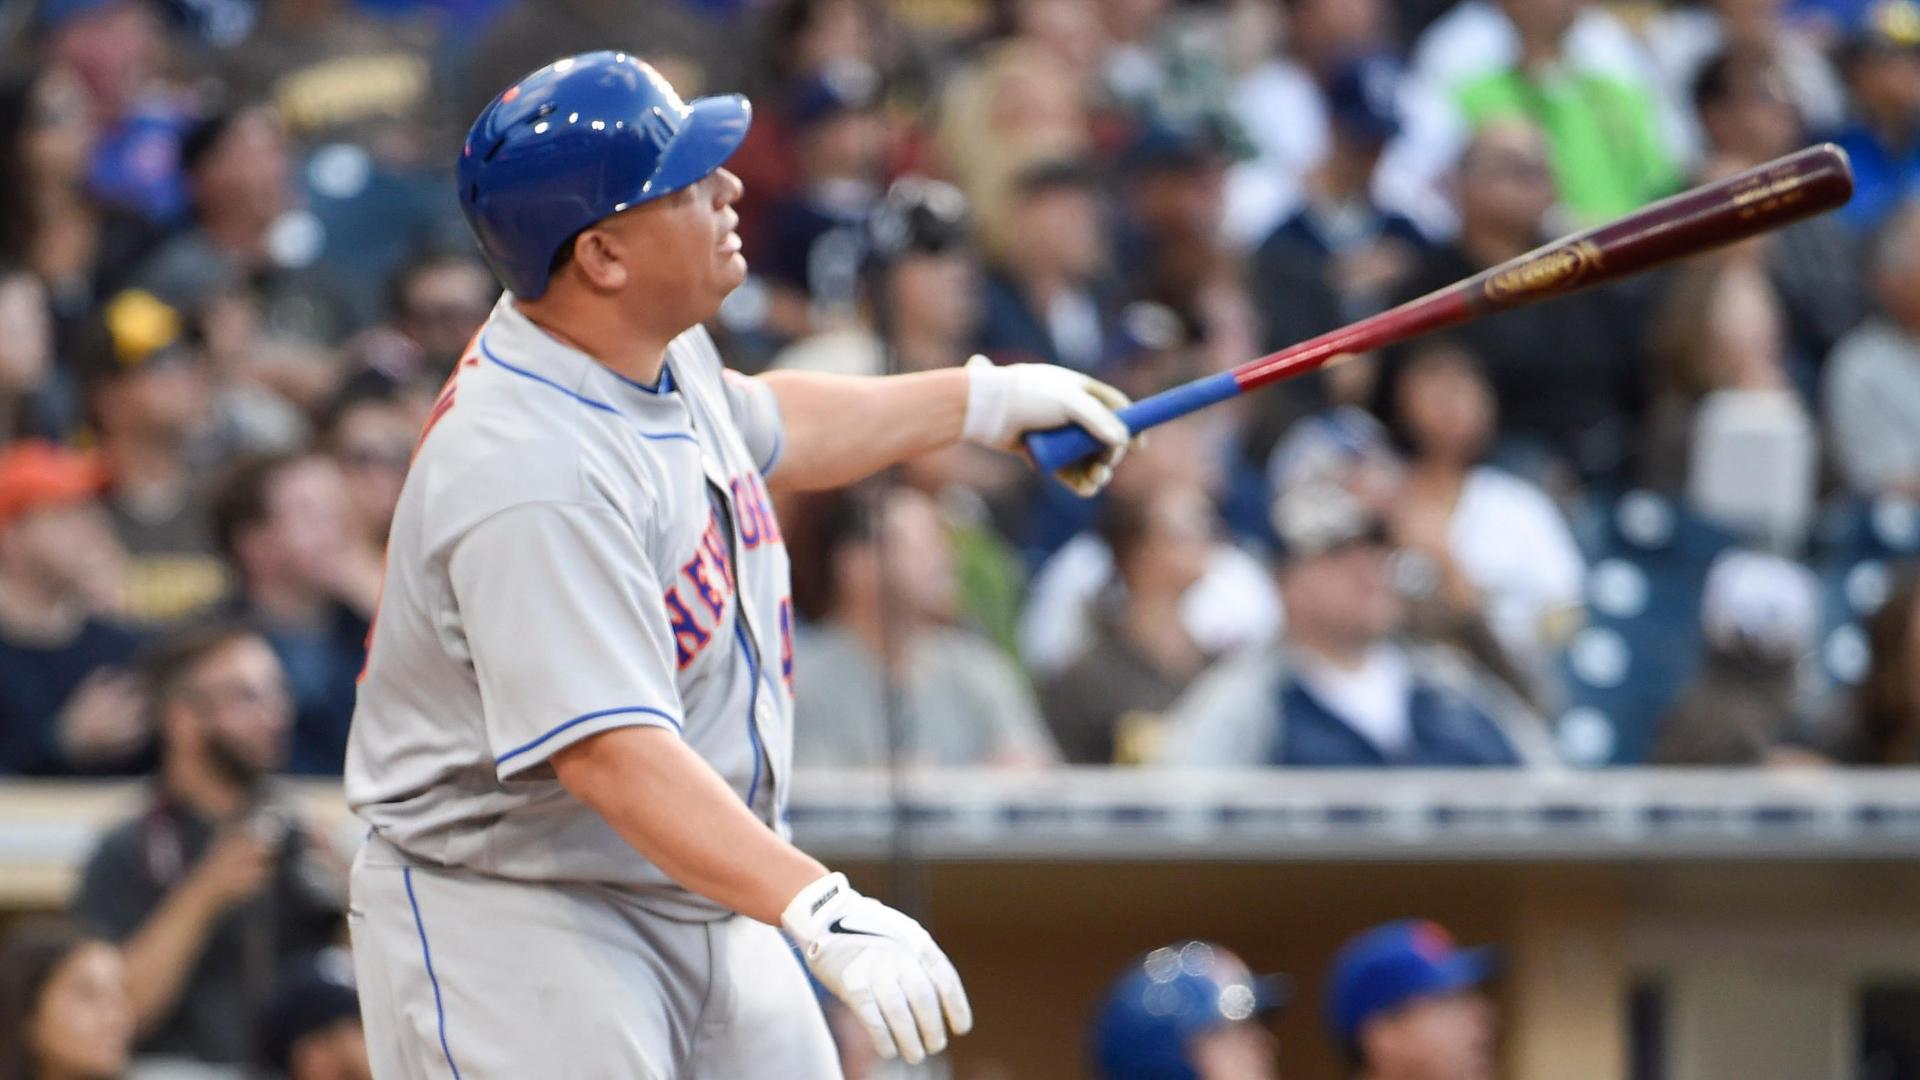 http://a.espncdn.com/media/motion/2016/0508/dm_160507_MLB_Colon_HR1022/dm_160507_MLB_Colon_HR1022.jpg